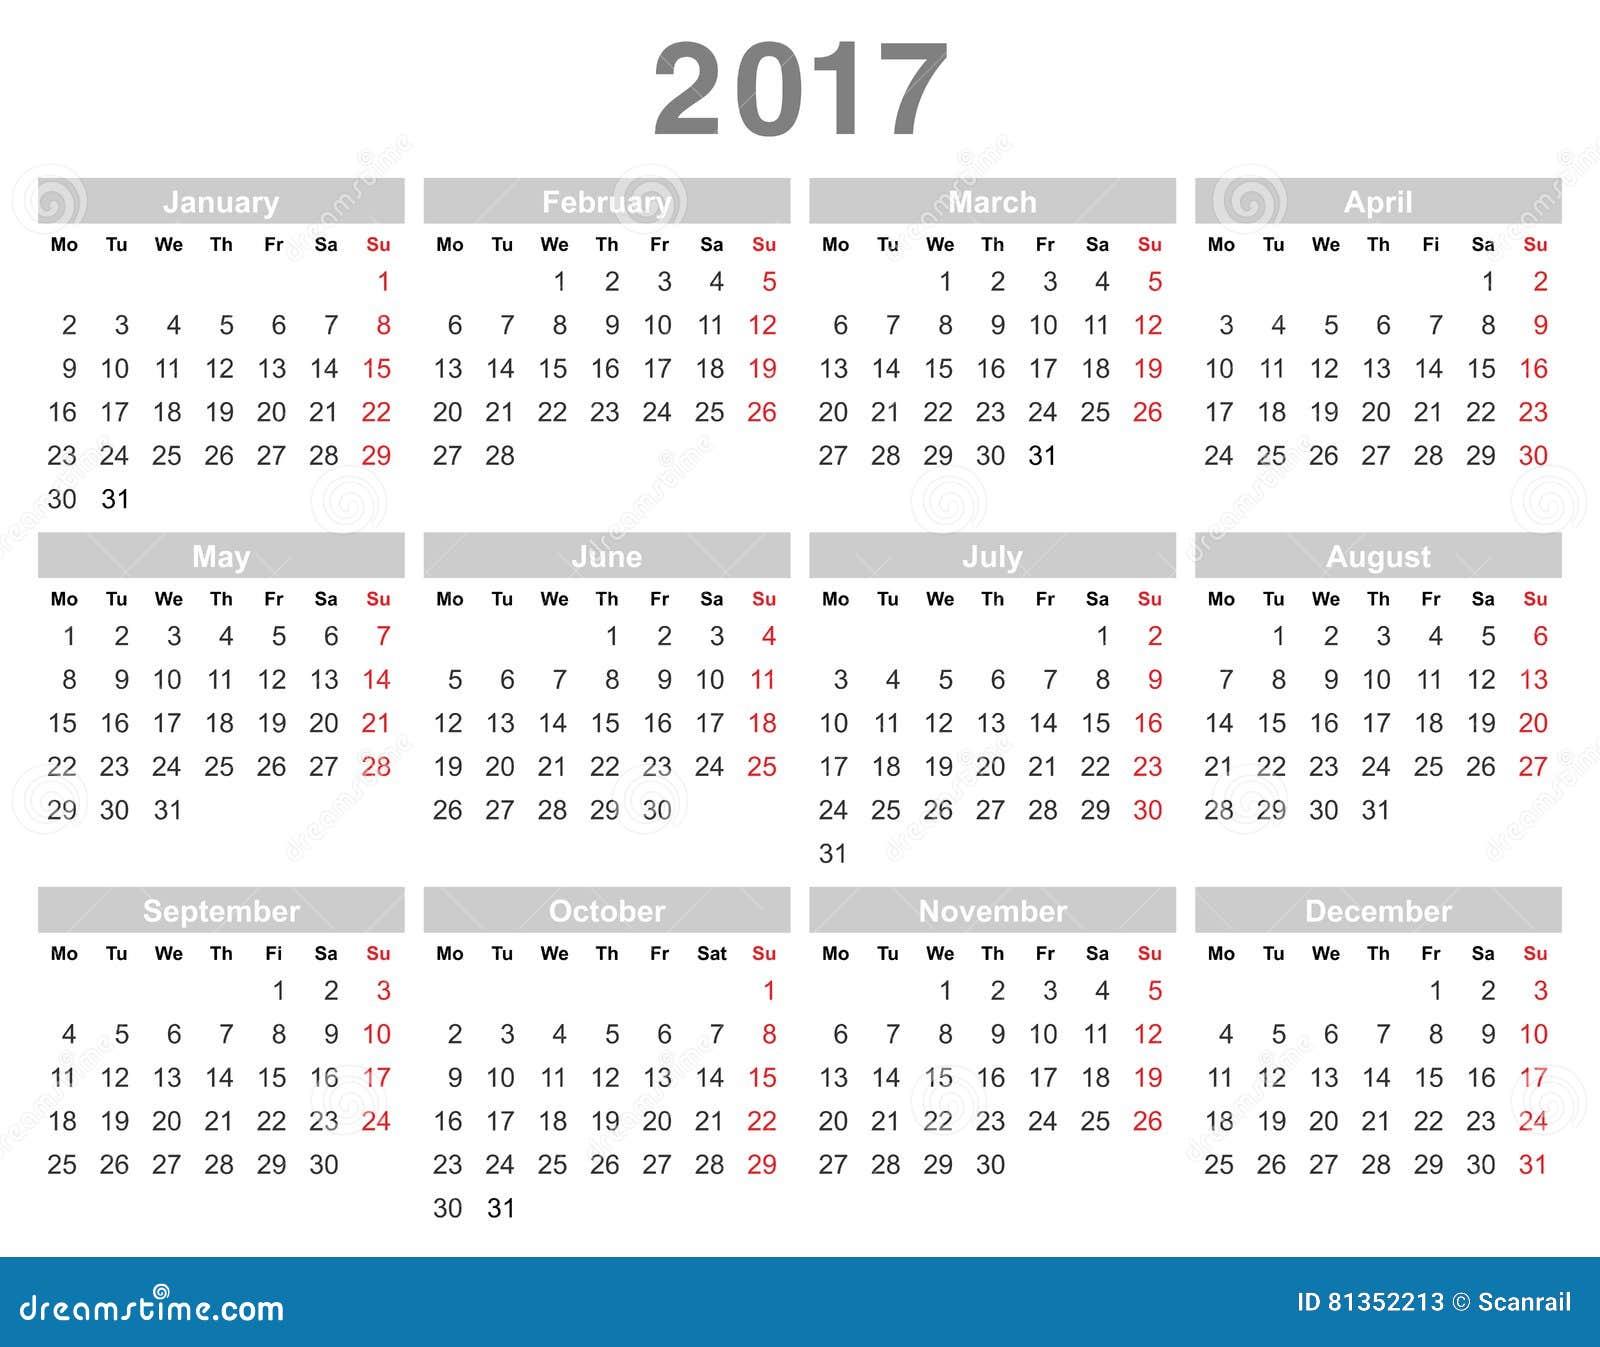 2017 full year calendar